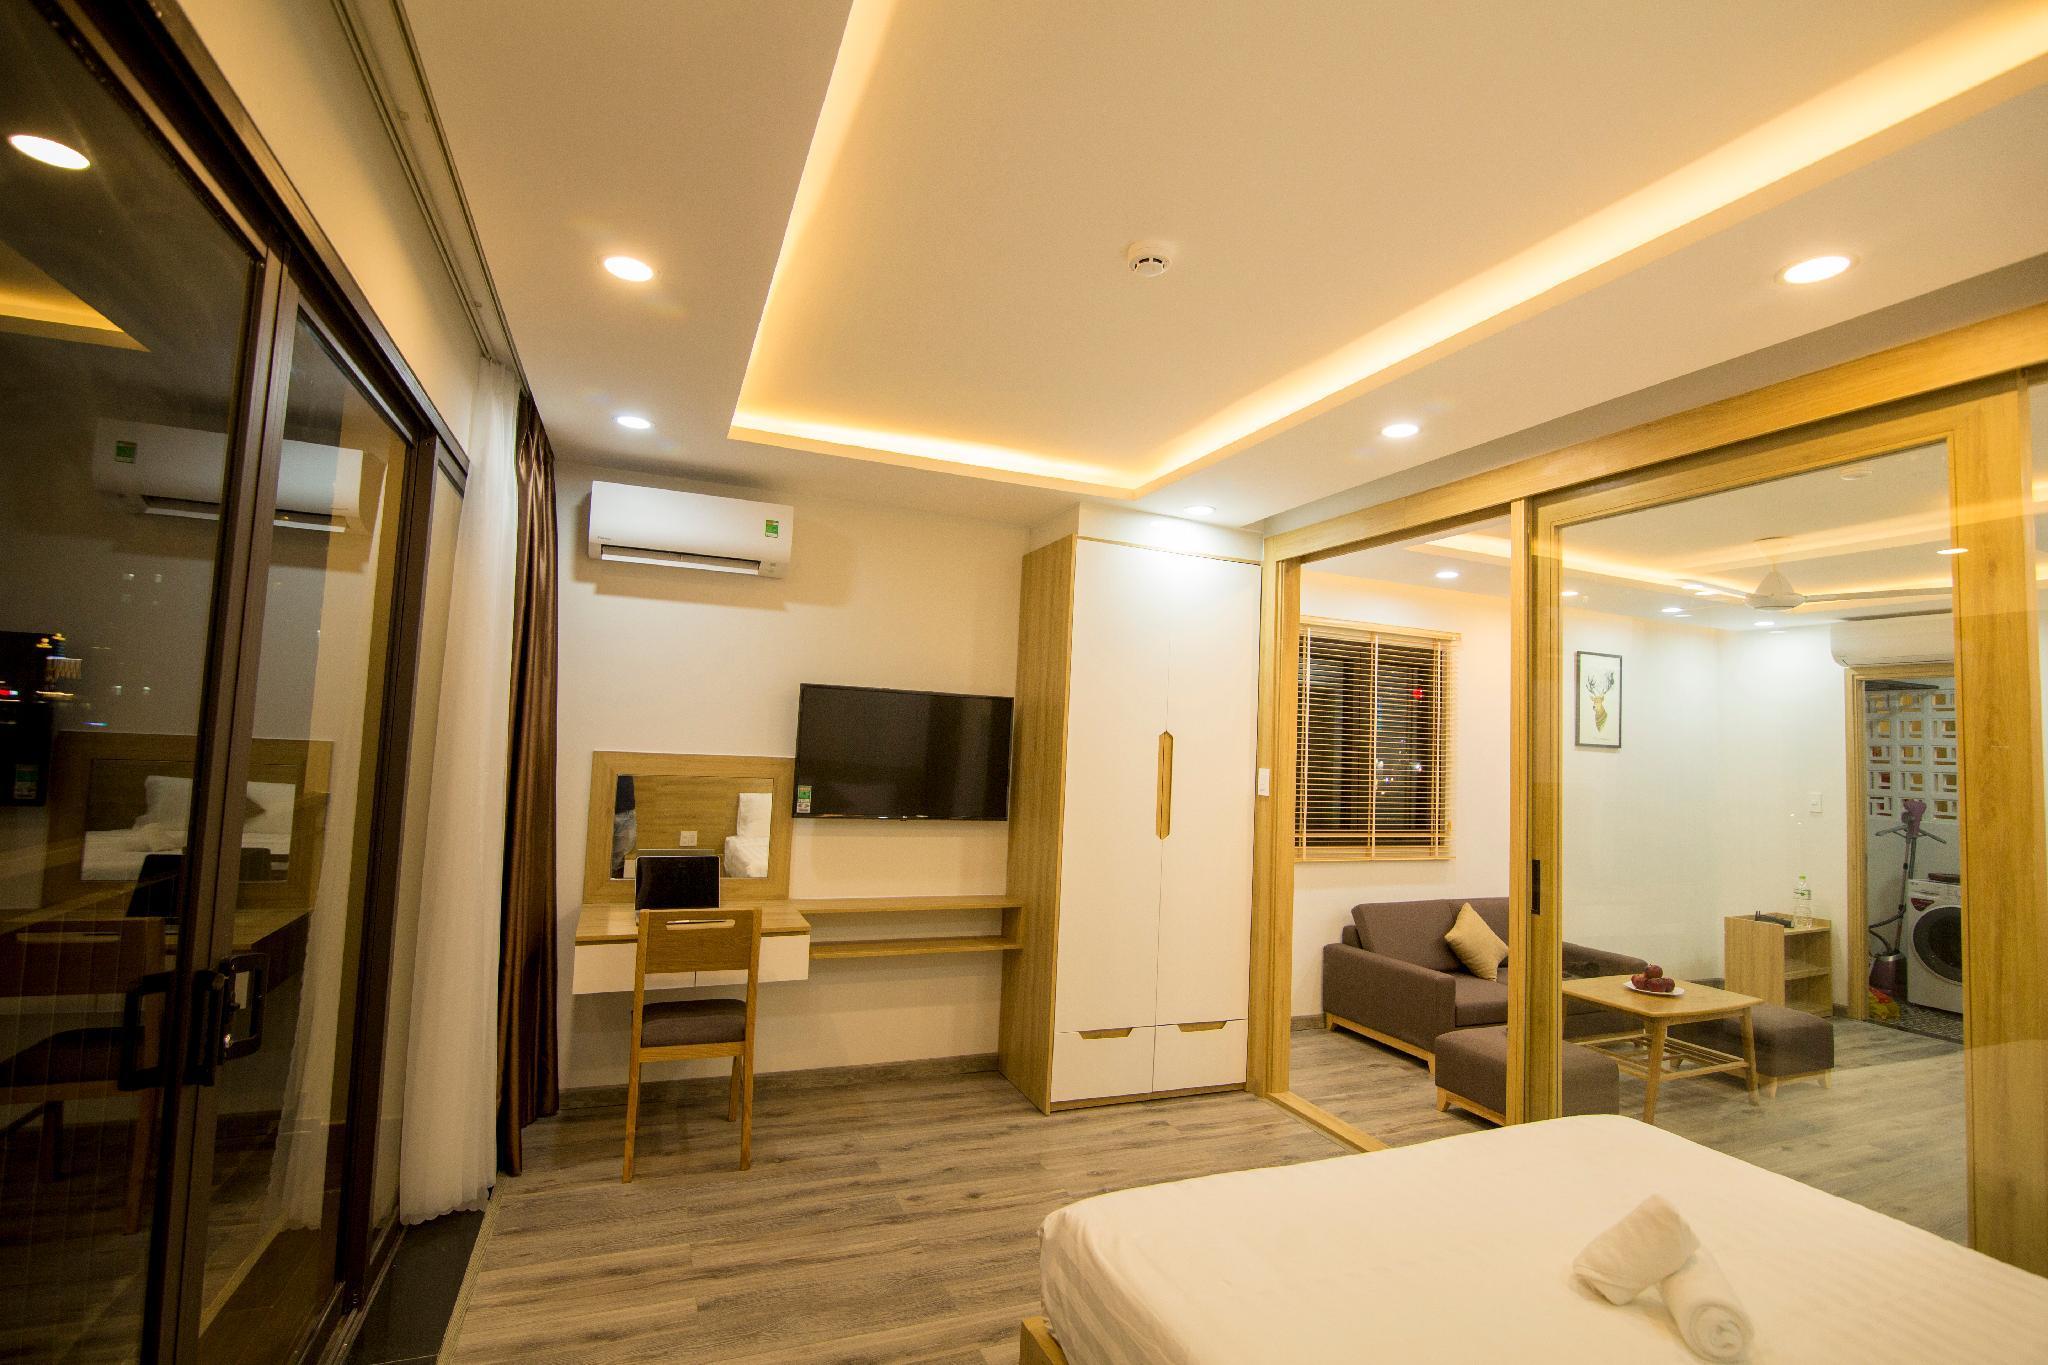 TONY APARTMENT*65m2*1BR*Luxury*Balcony*Beach*B